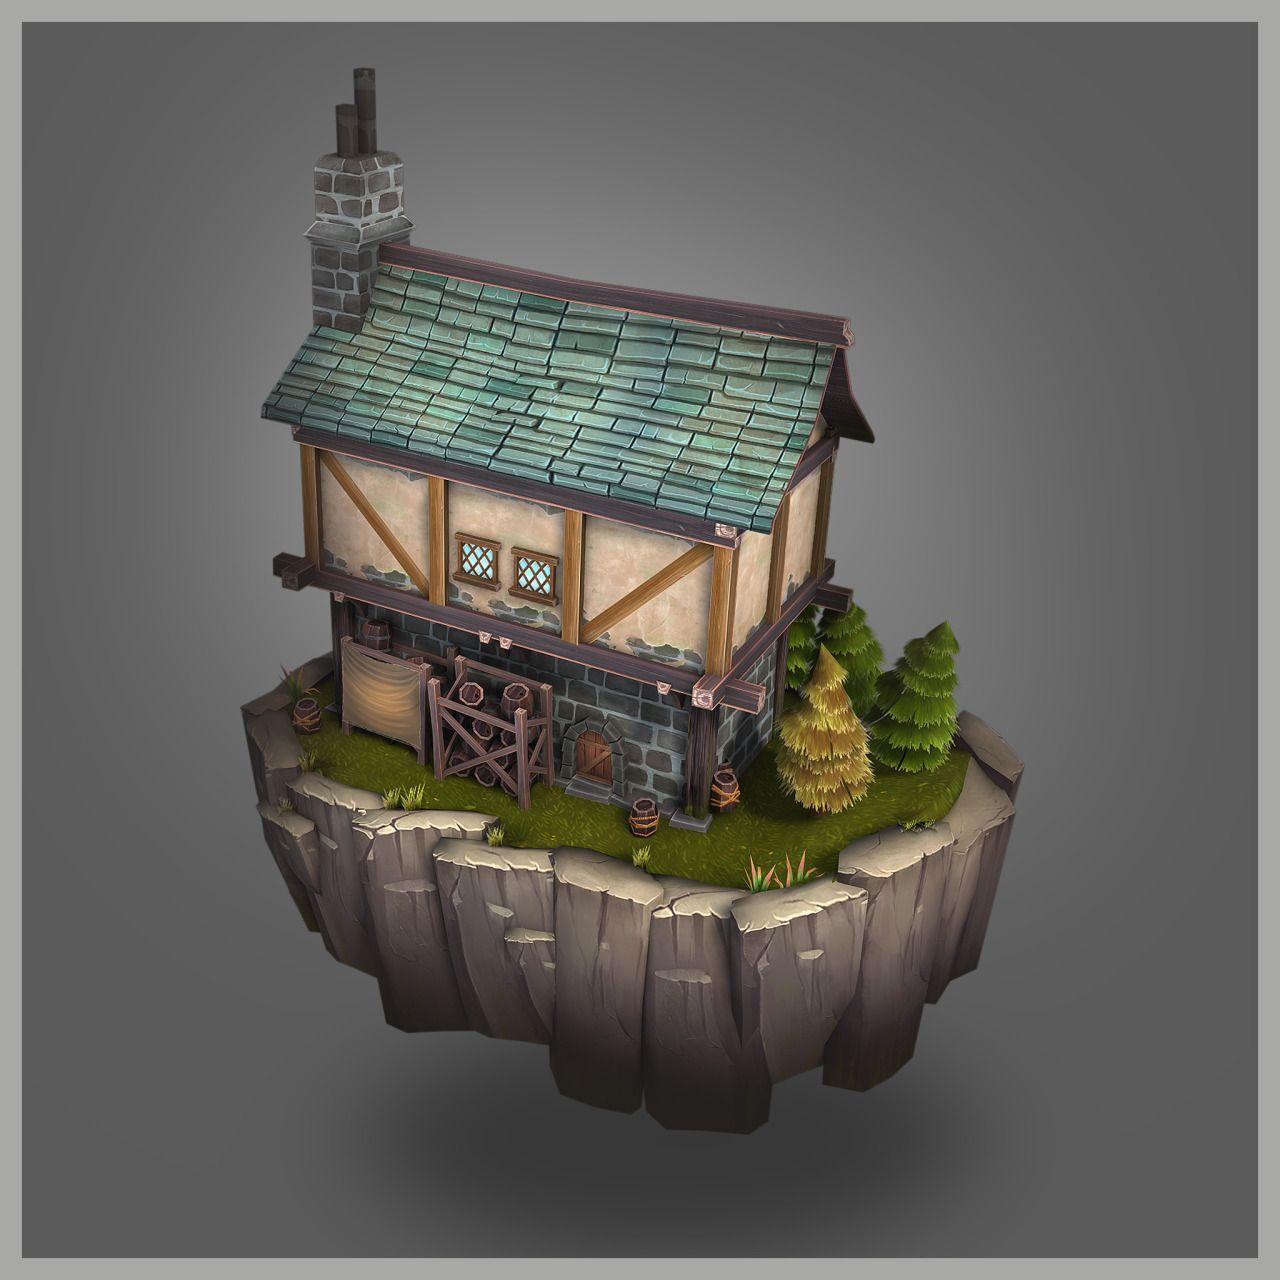 Free 3d Home Design Software Uk: Bitgem 3D Model Store Characters Buildings Props Textures